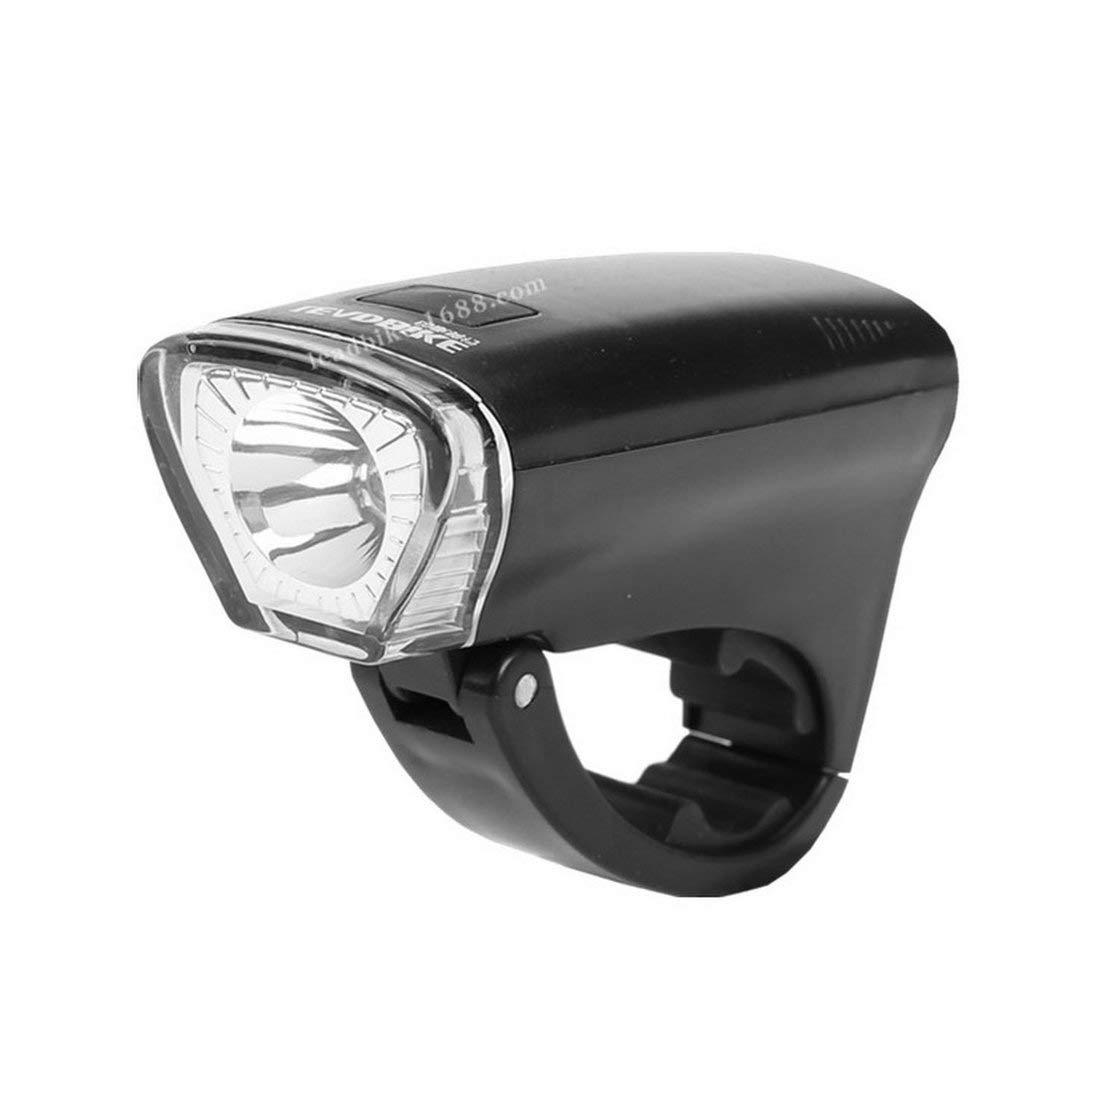 Gwendoll Bicicleta de luz Super Brillante Linterna de la Bici de la Bicicleta USB Recargable Linterna del Faro Resistente al Agua A126 Ligero de la Bicicleta